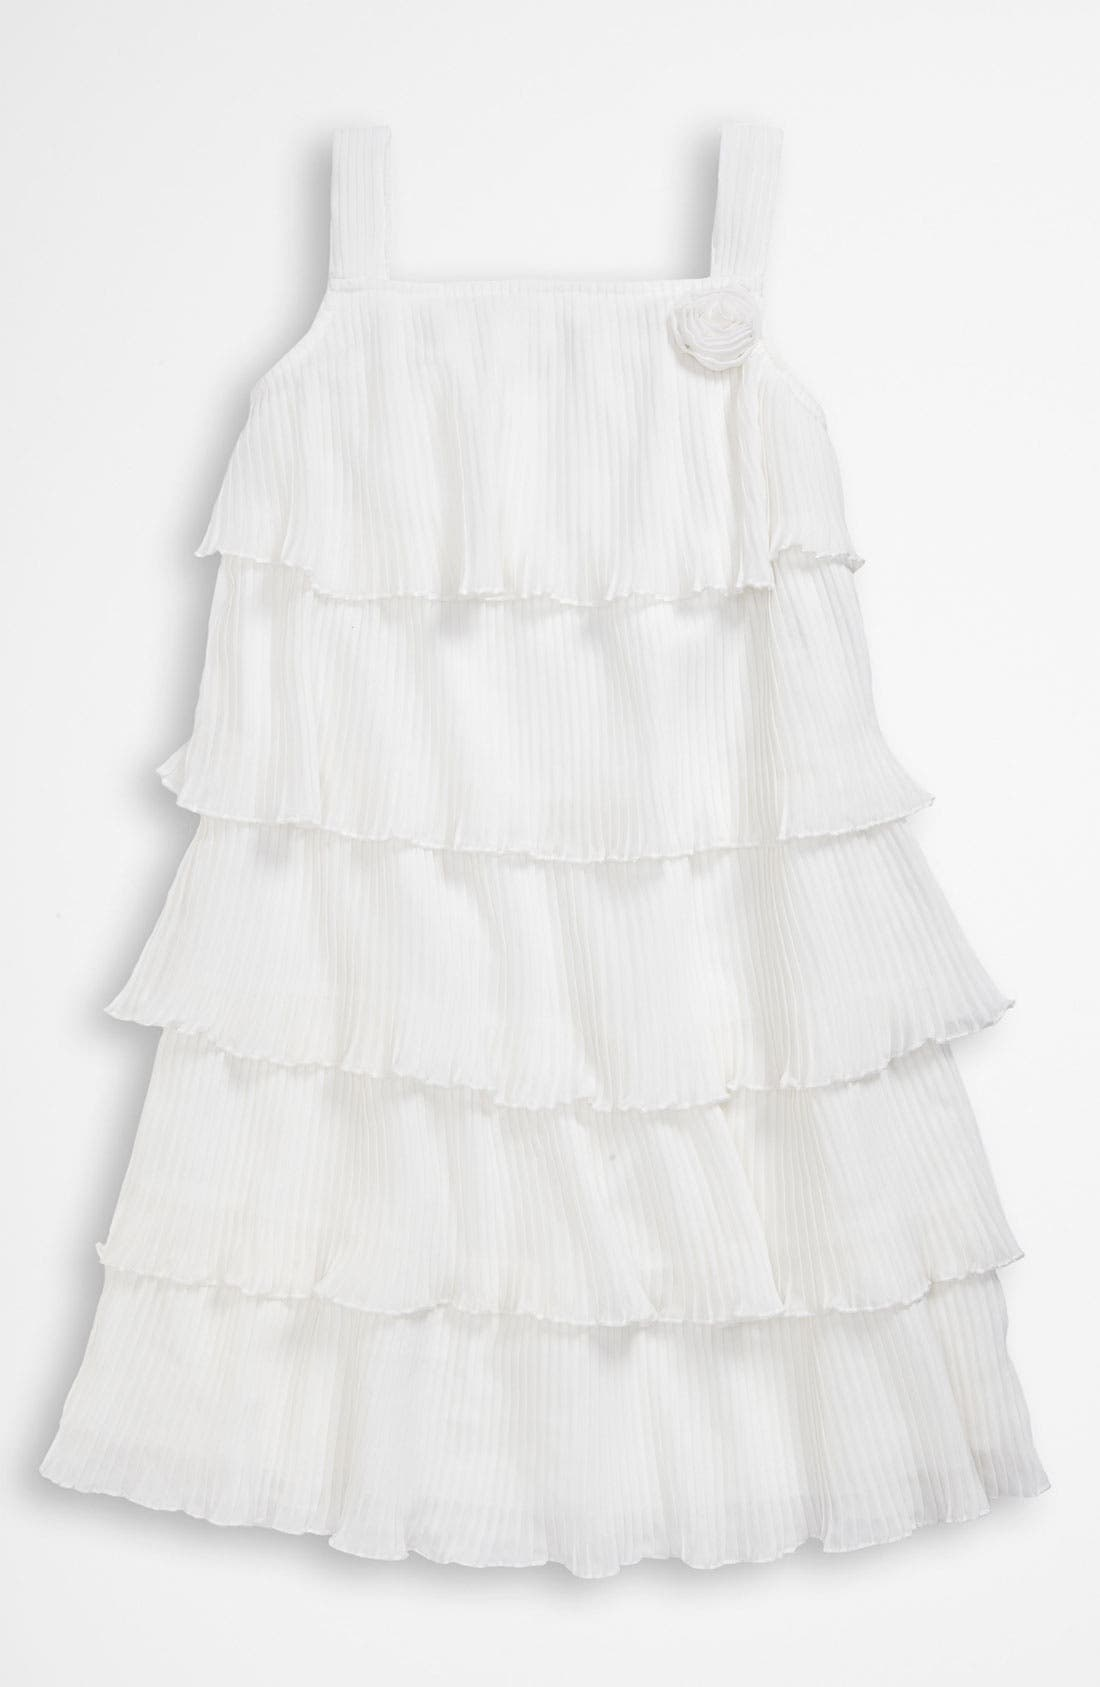 Alternate Image 1 Selected - United Colors of Benetton Kids Ruffle Dress (Little Girls & Big Girls)